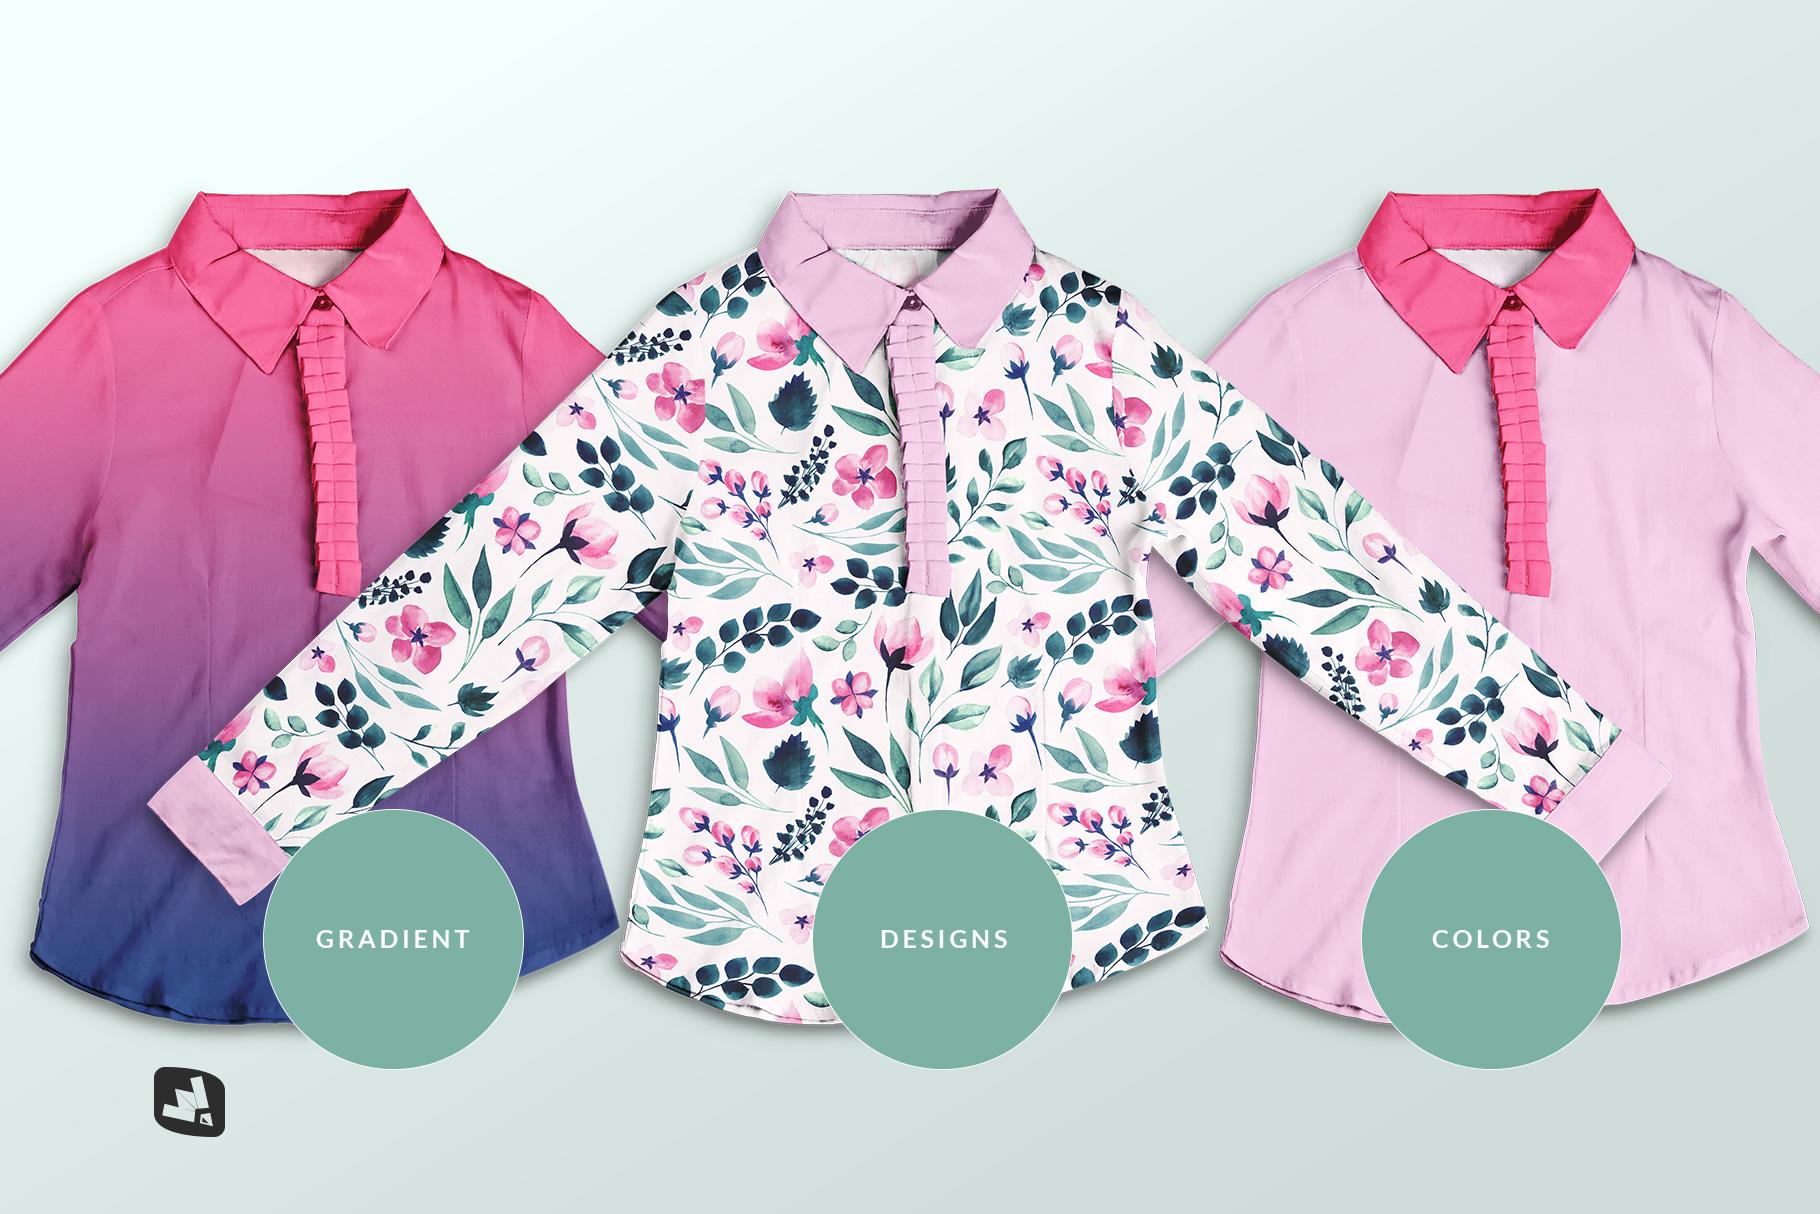 types of the women's full sleeve blouse mockup